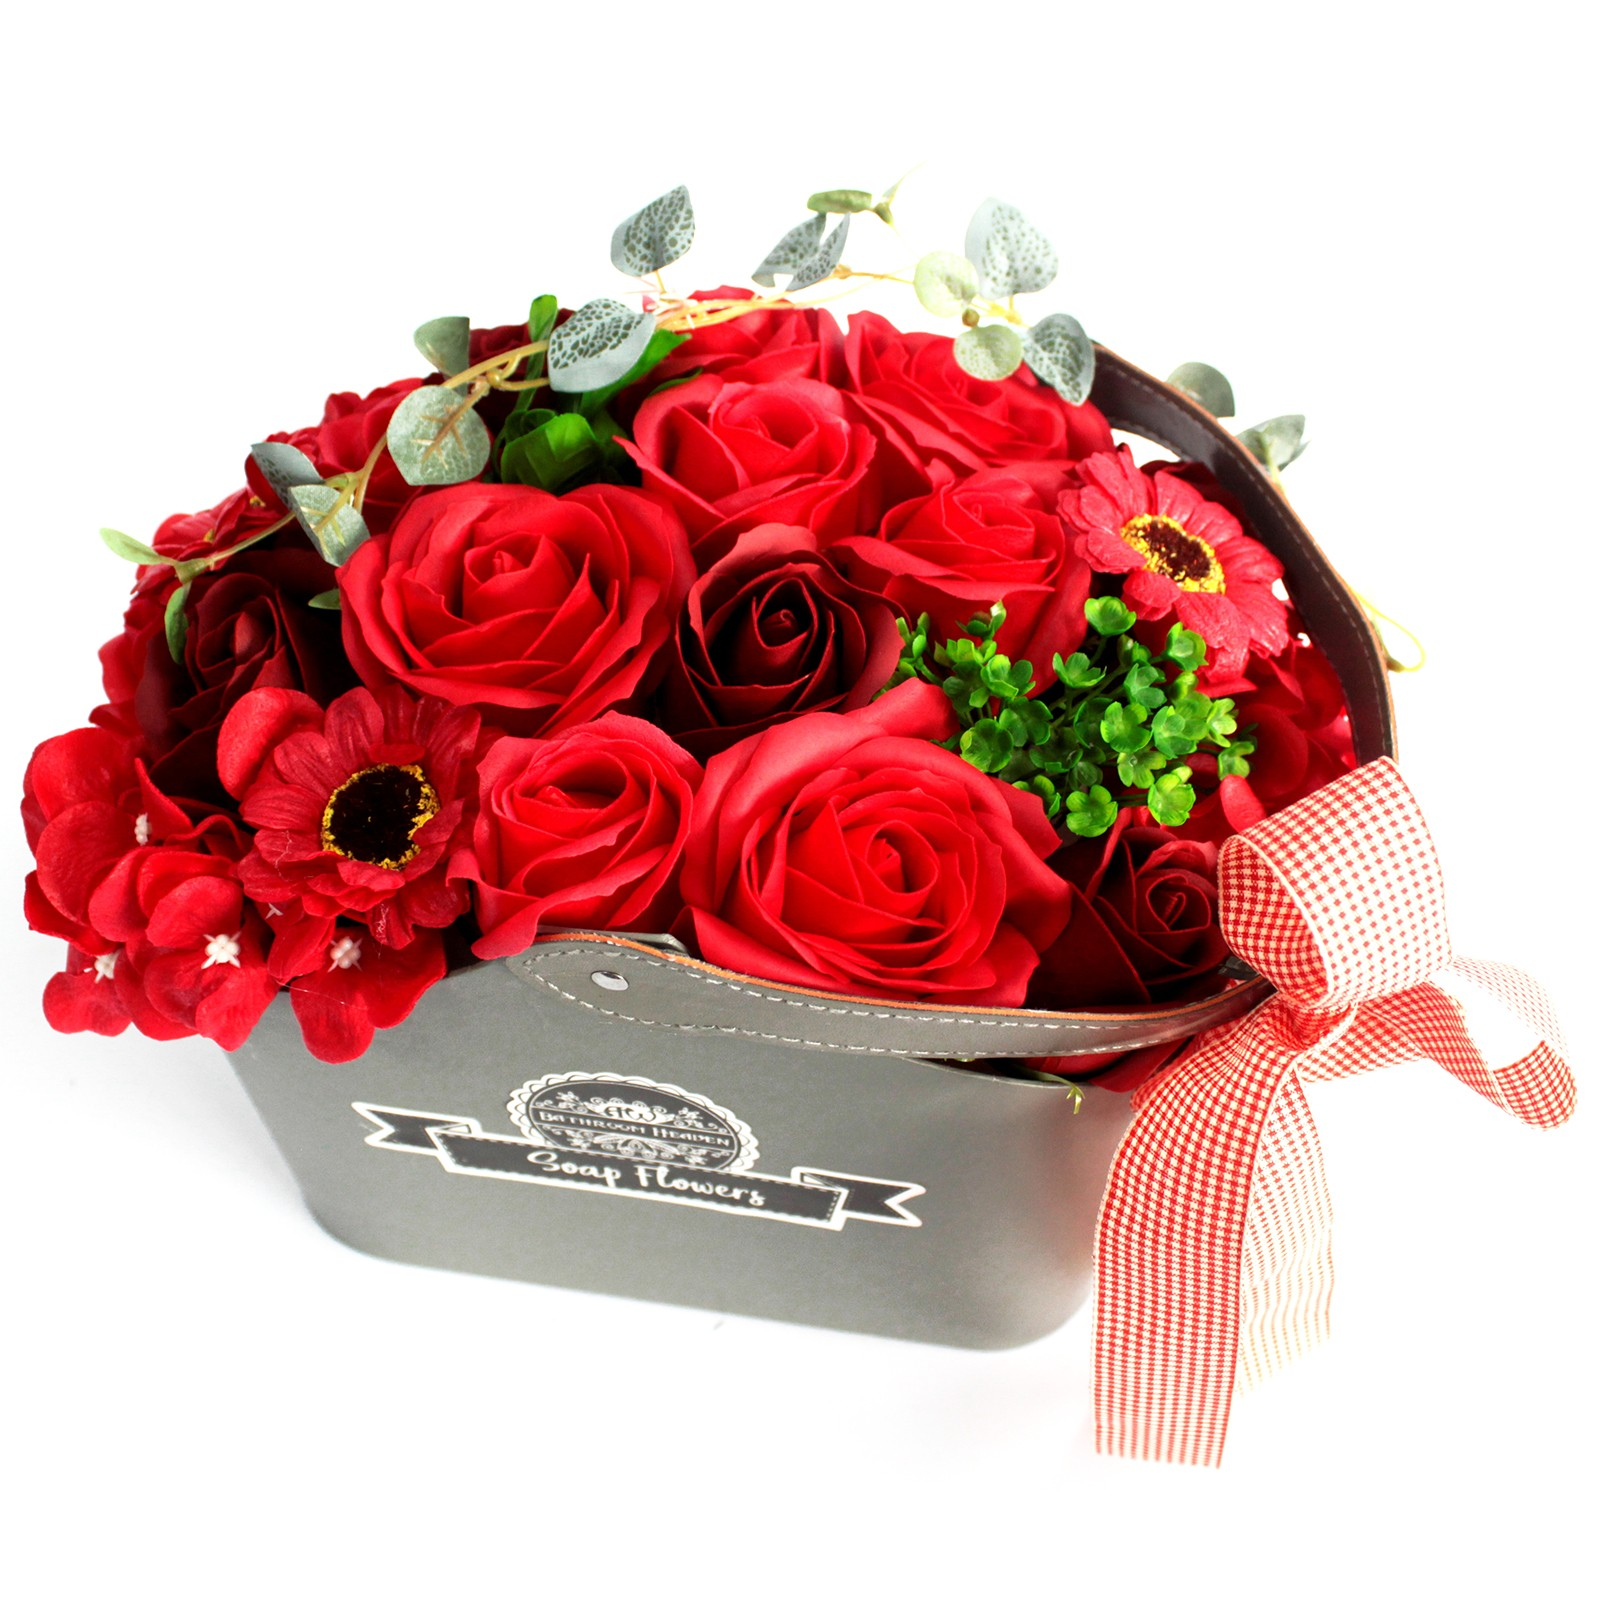 Bath fizzy flower bouquet redpinklilacorange pure oils bath fizzy flower bouquet redpinklilacorange mightylinksfo